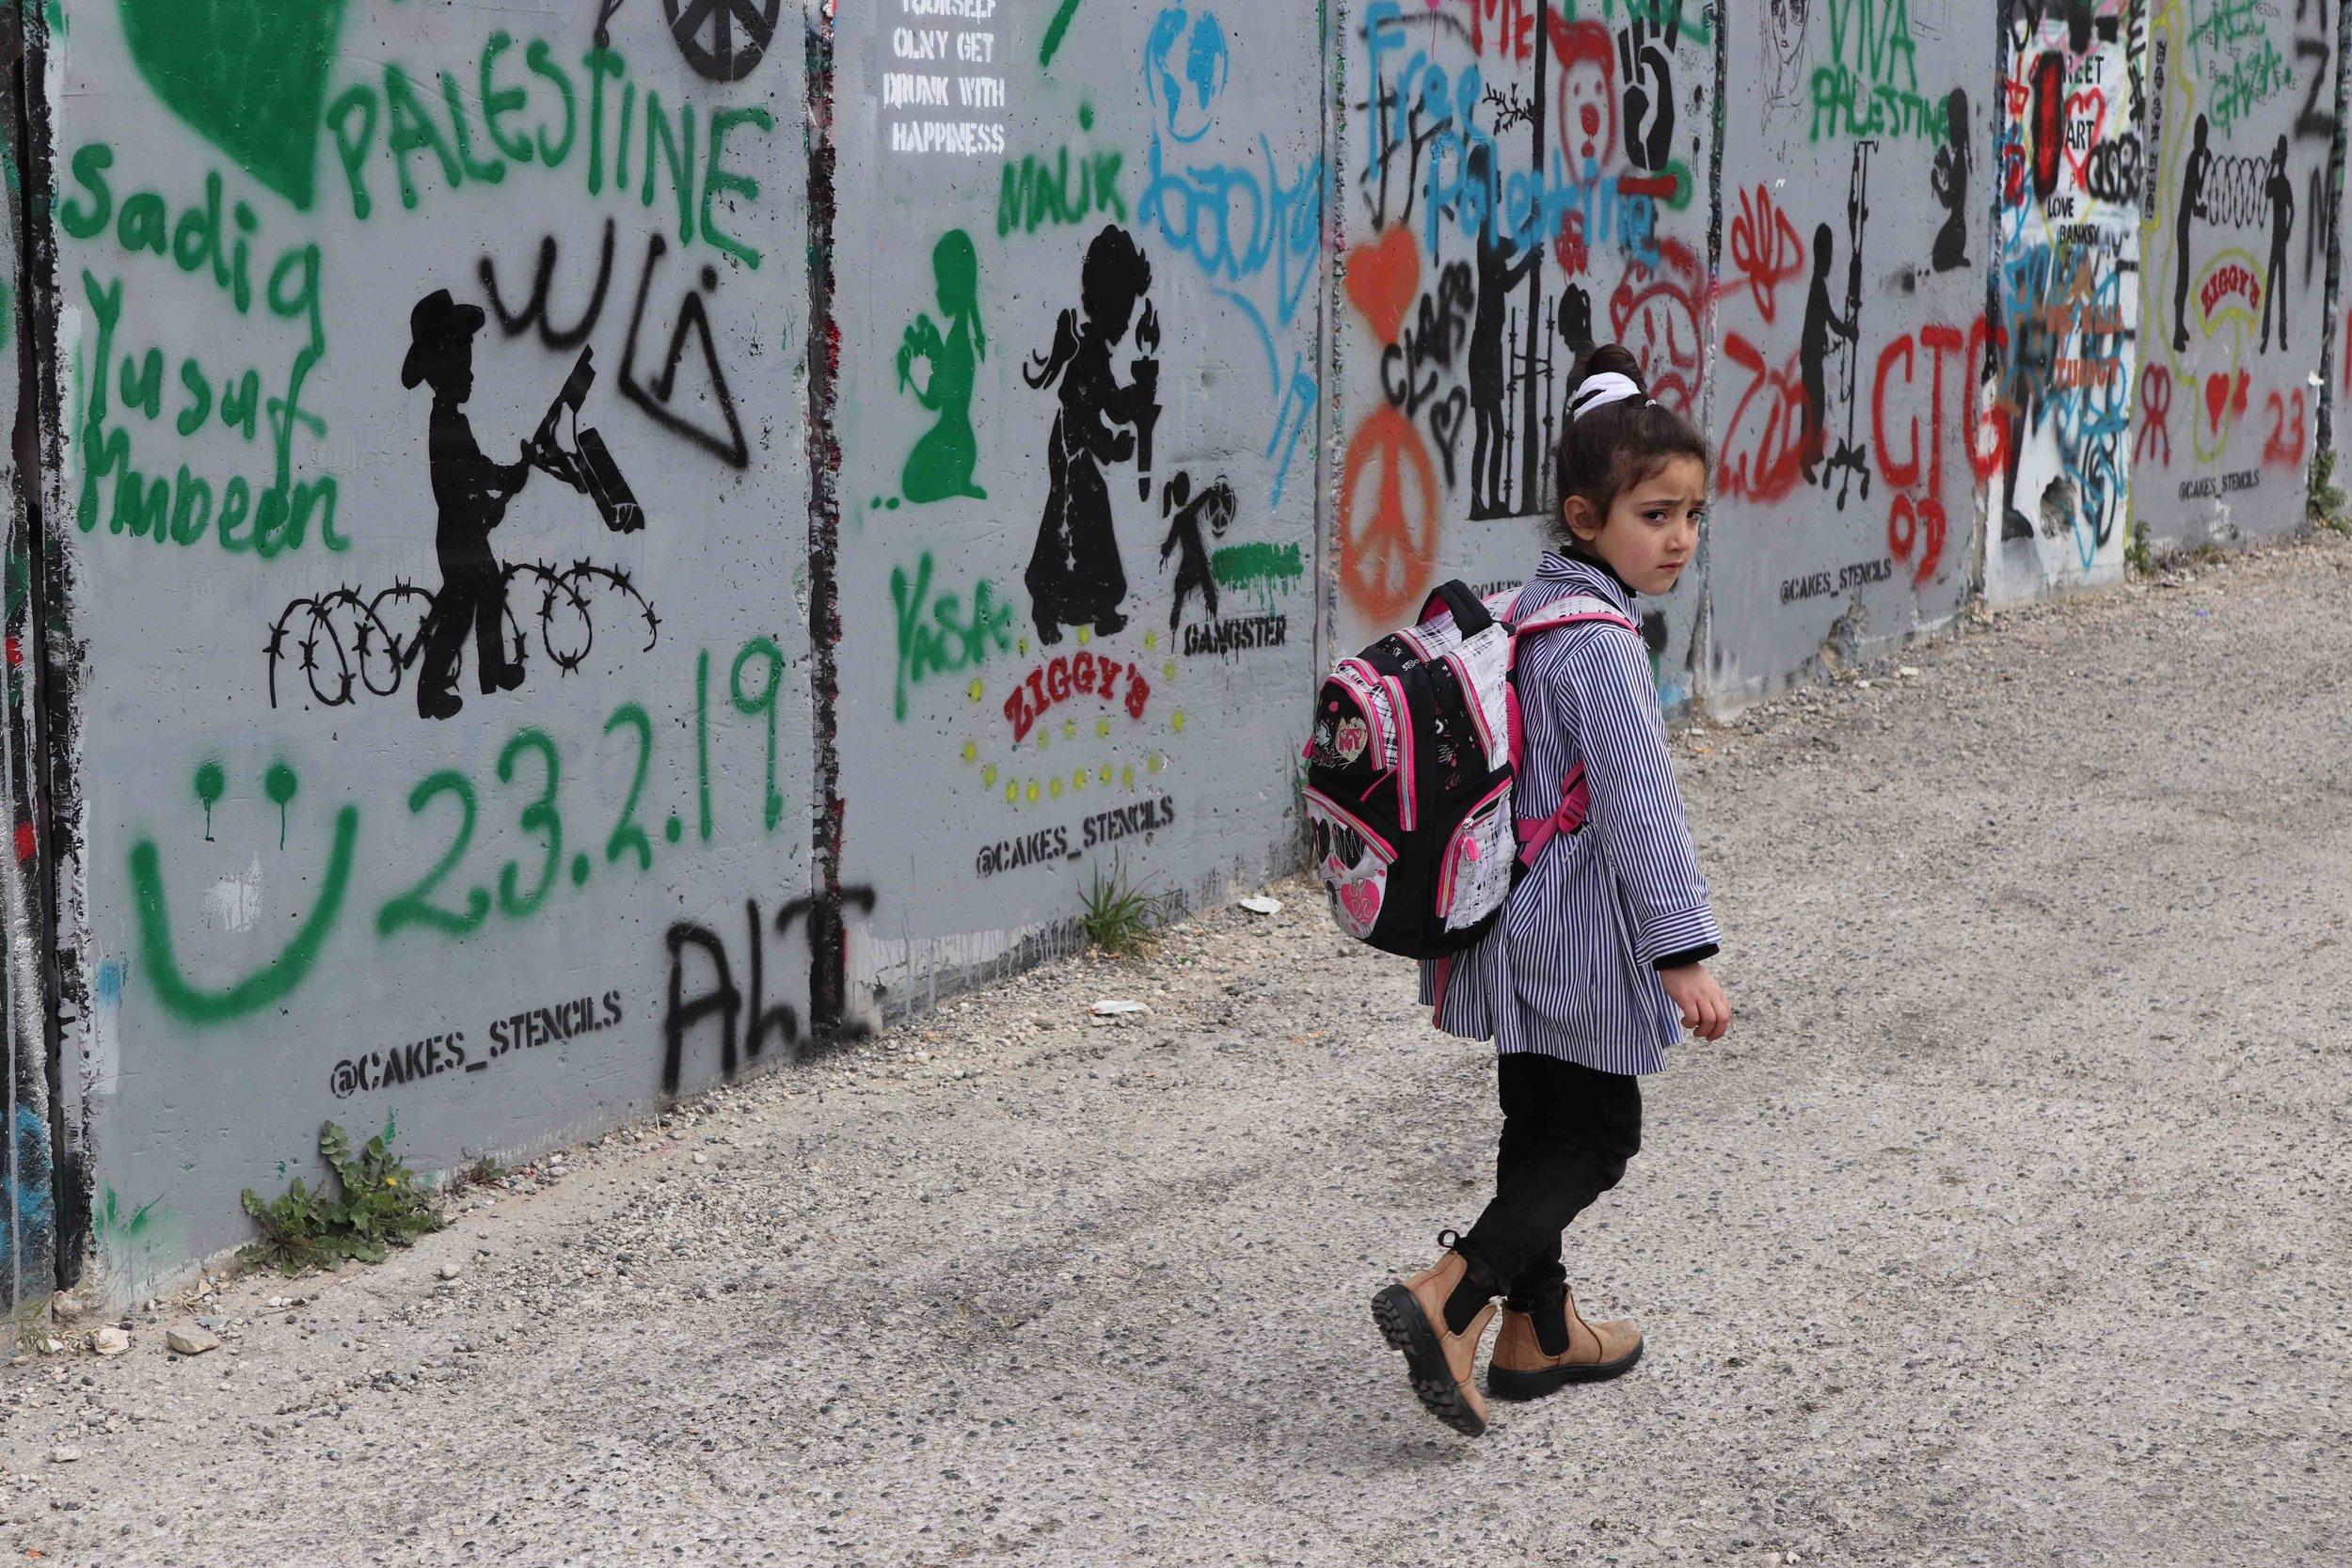 Palestinian girl walks on her side of the barrier wall in Bethlehem.